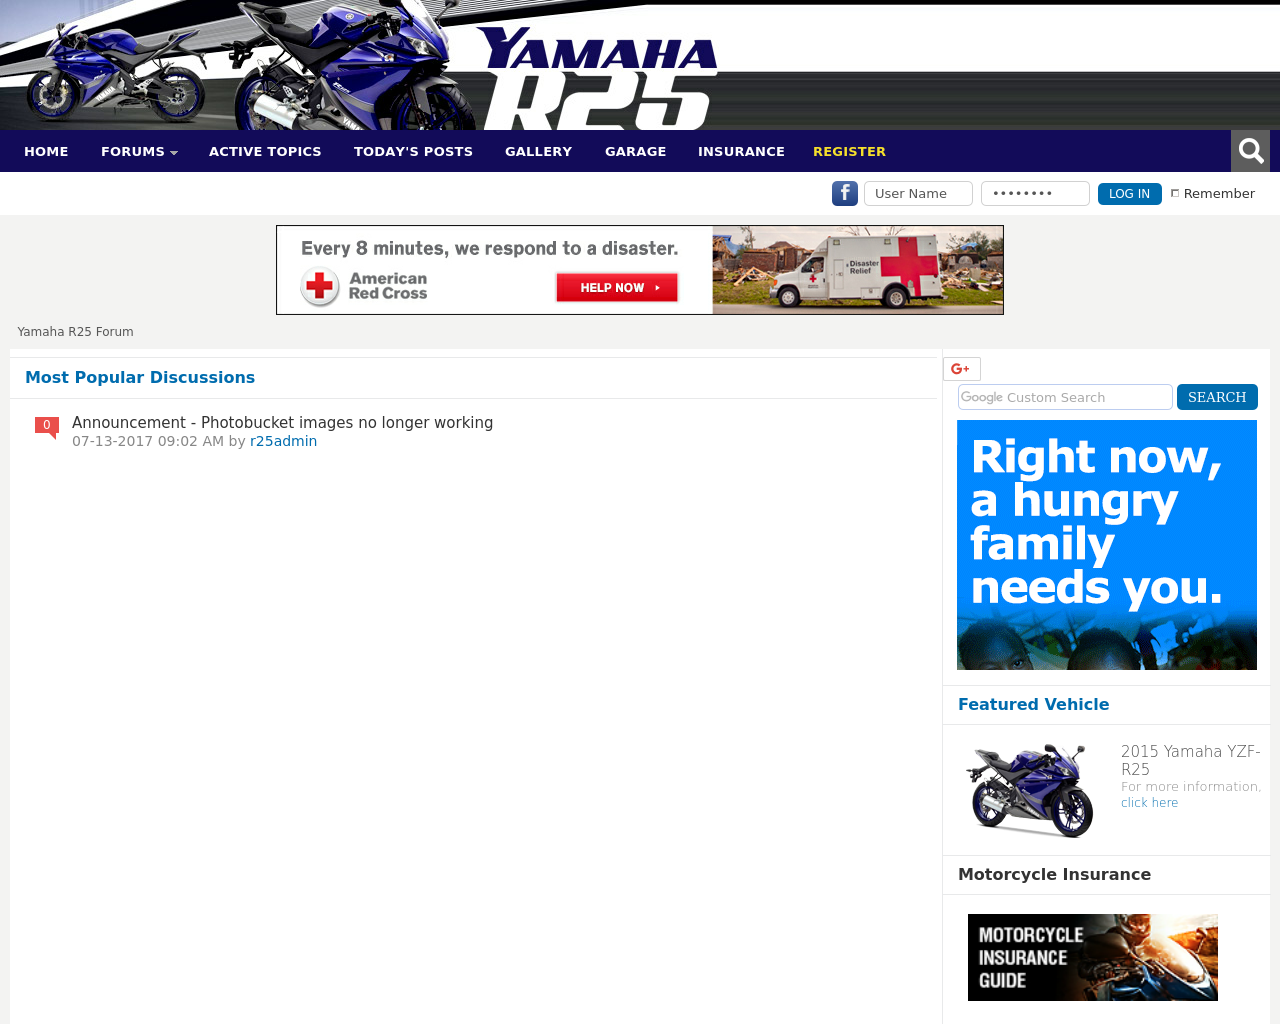 Yamaha-R25-Forum-Advertising-Reviews-Pricing